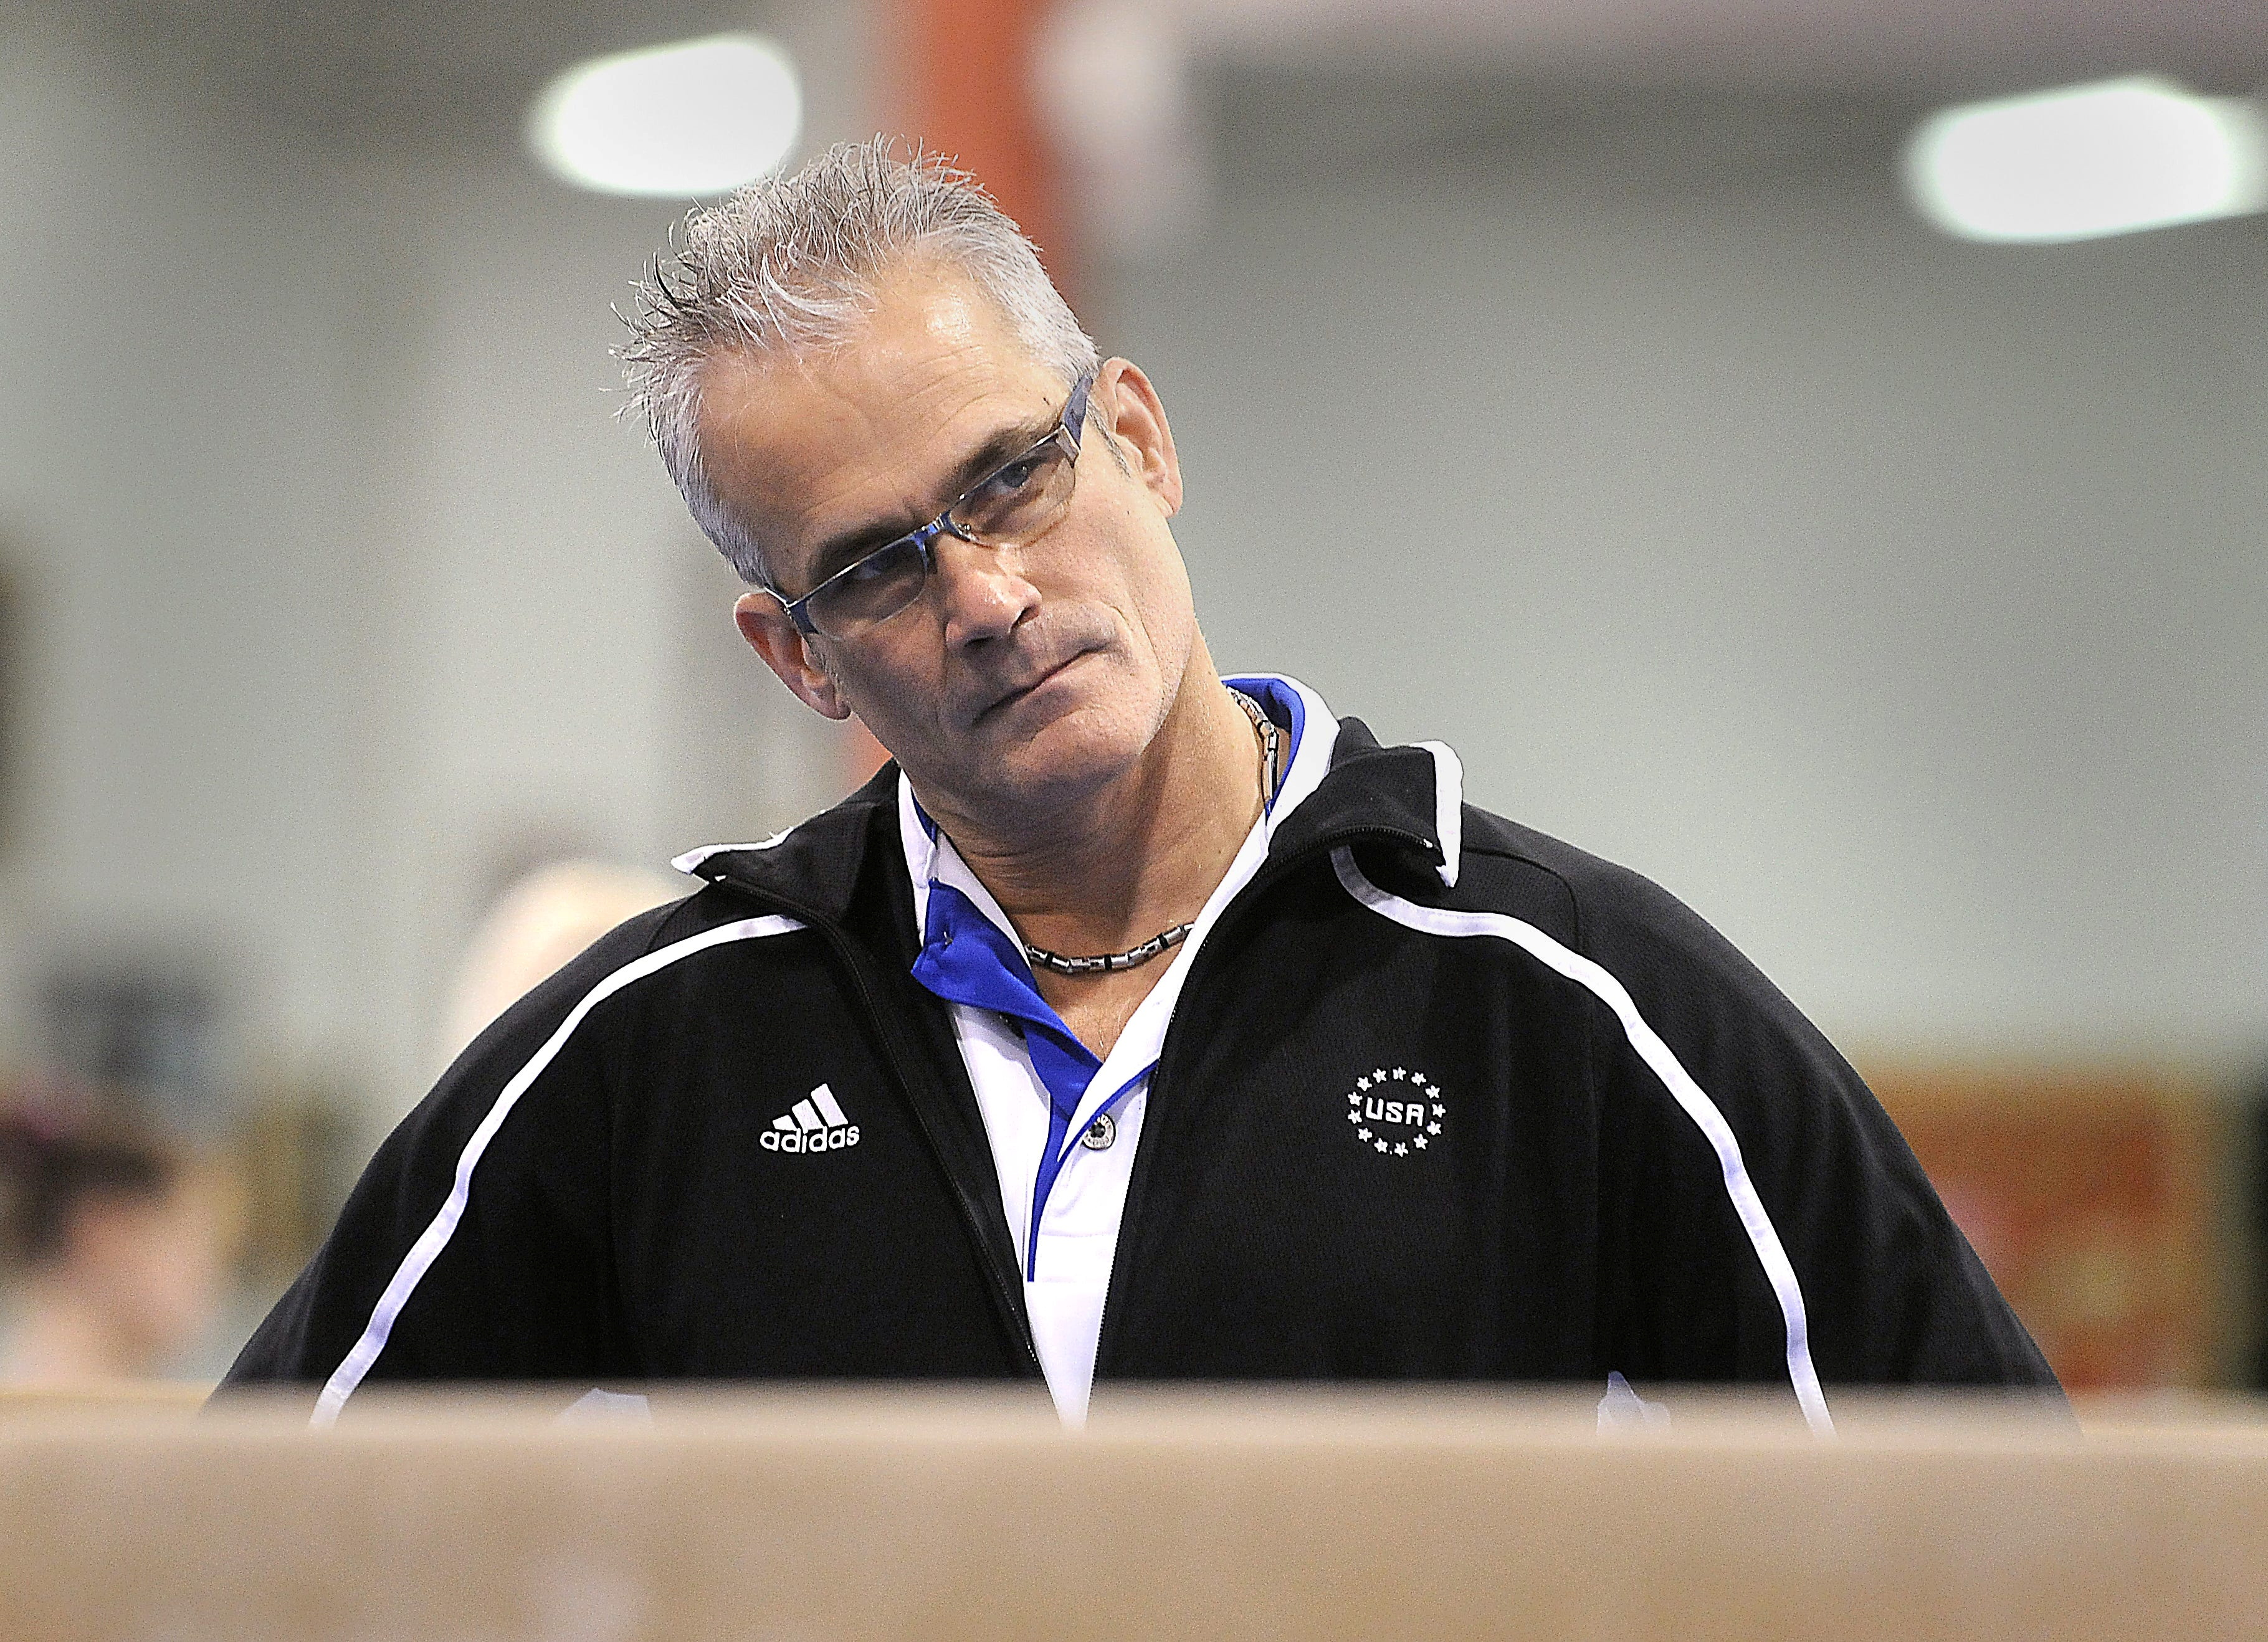 Gymnastics coach John Geddert watches his students during a practice in Lansing, Michigan, U.S. December 14, 2011. Greg DeRuiter/Lansing State Journal/USA Today Network via REUTERS.